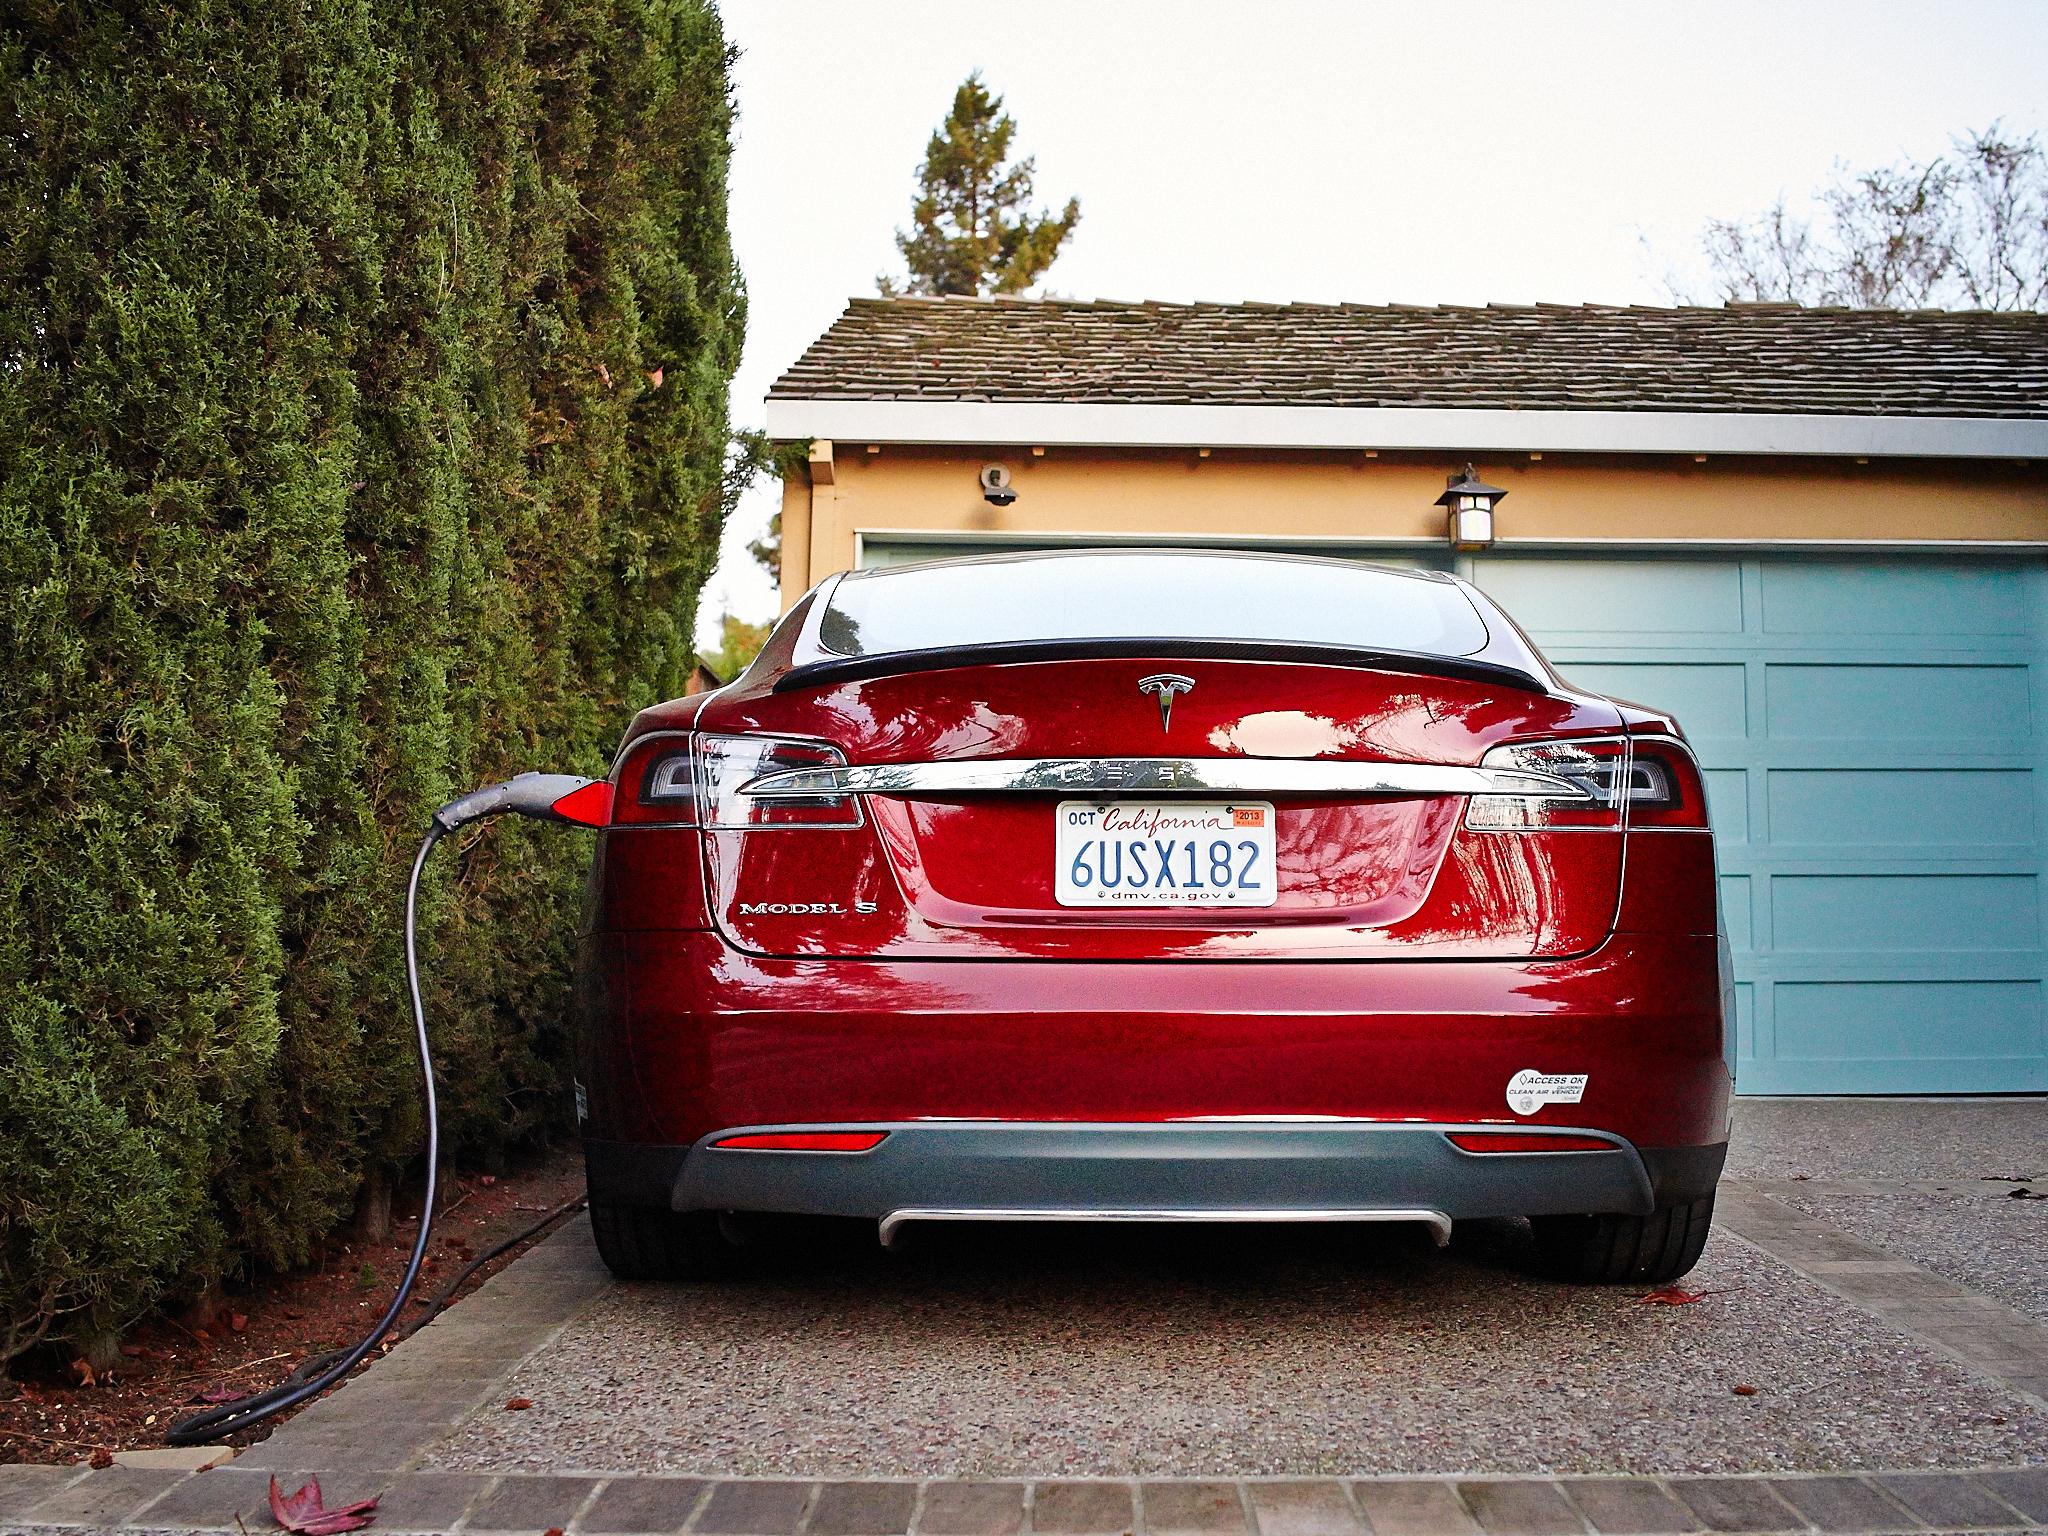 Telsa Model S Charging by Peter Adams.